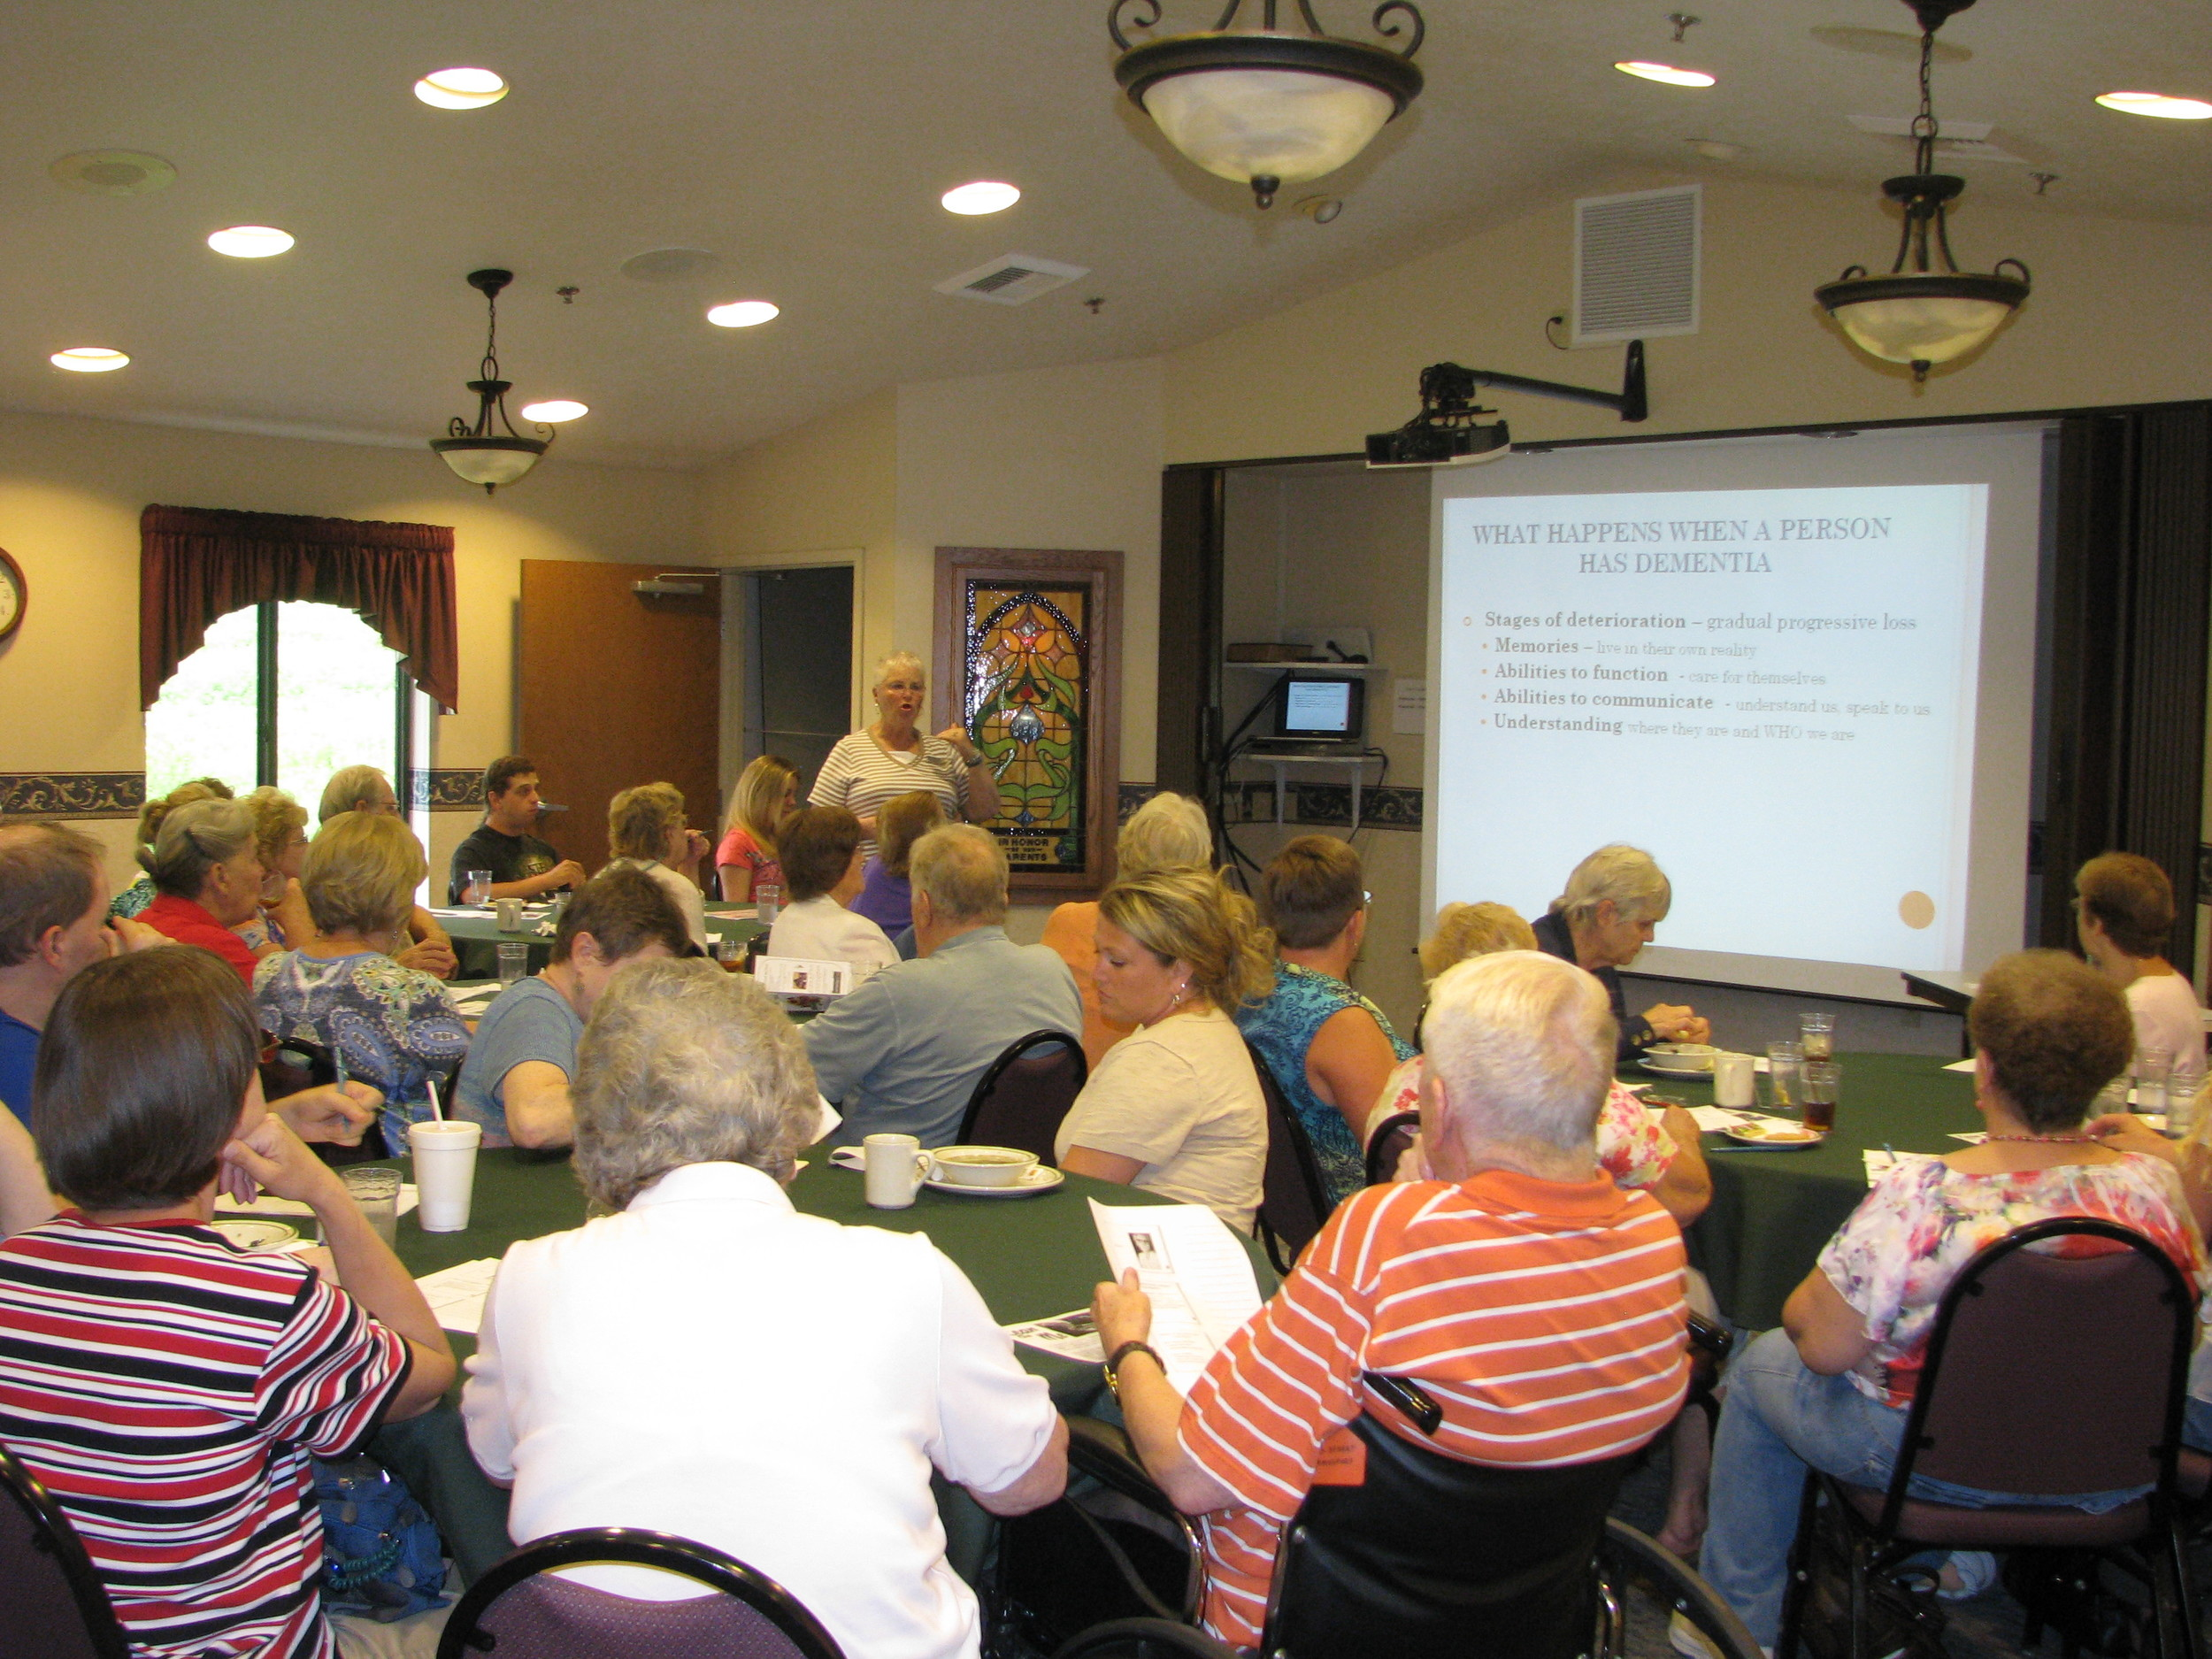 Nationally known speaker, Kay Lynne Ege educates on Dementia at the Rolling Fields Speaker Series.